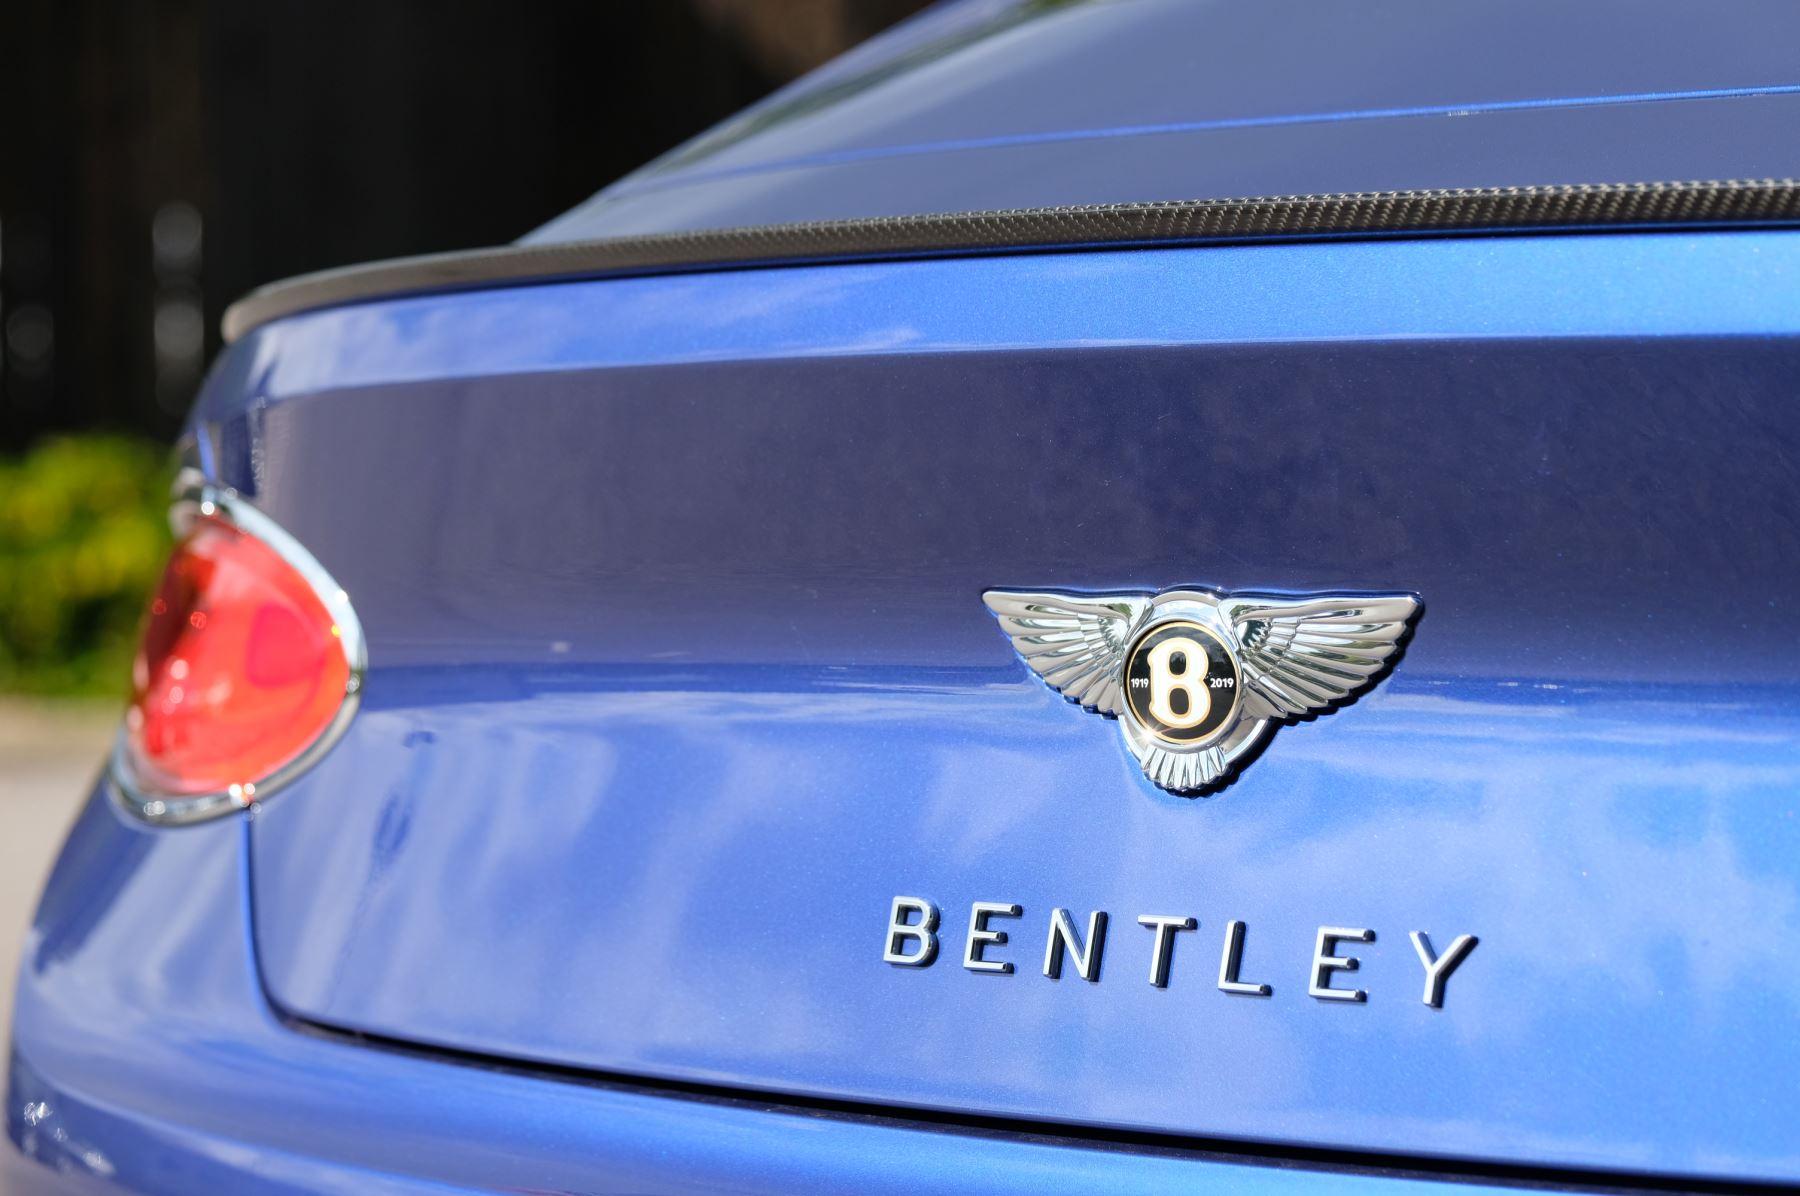 Bentley Continental GT 4.0 V8 2dr Mulliner Driving Specification image 8